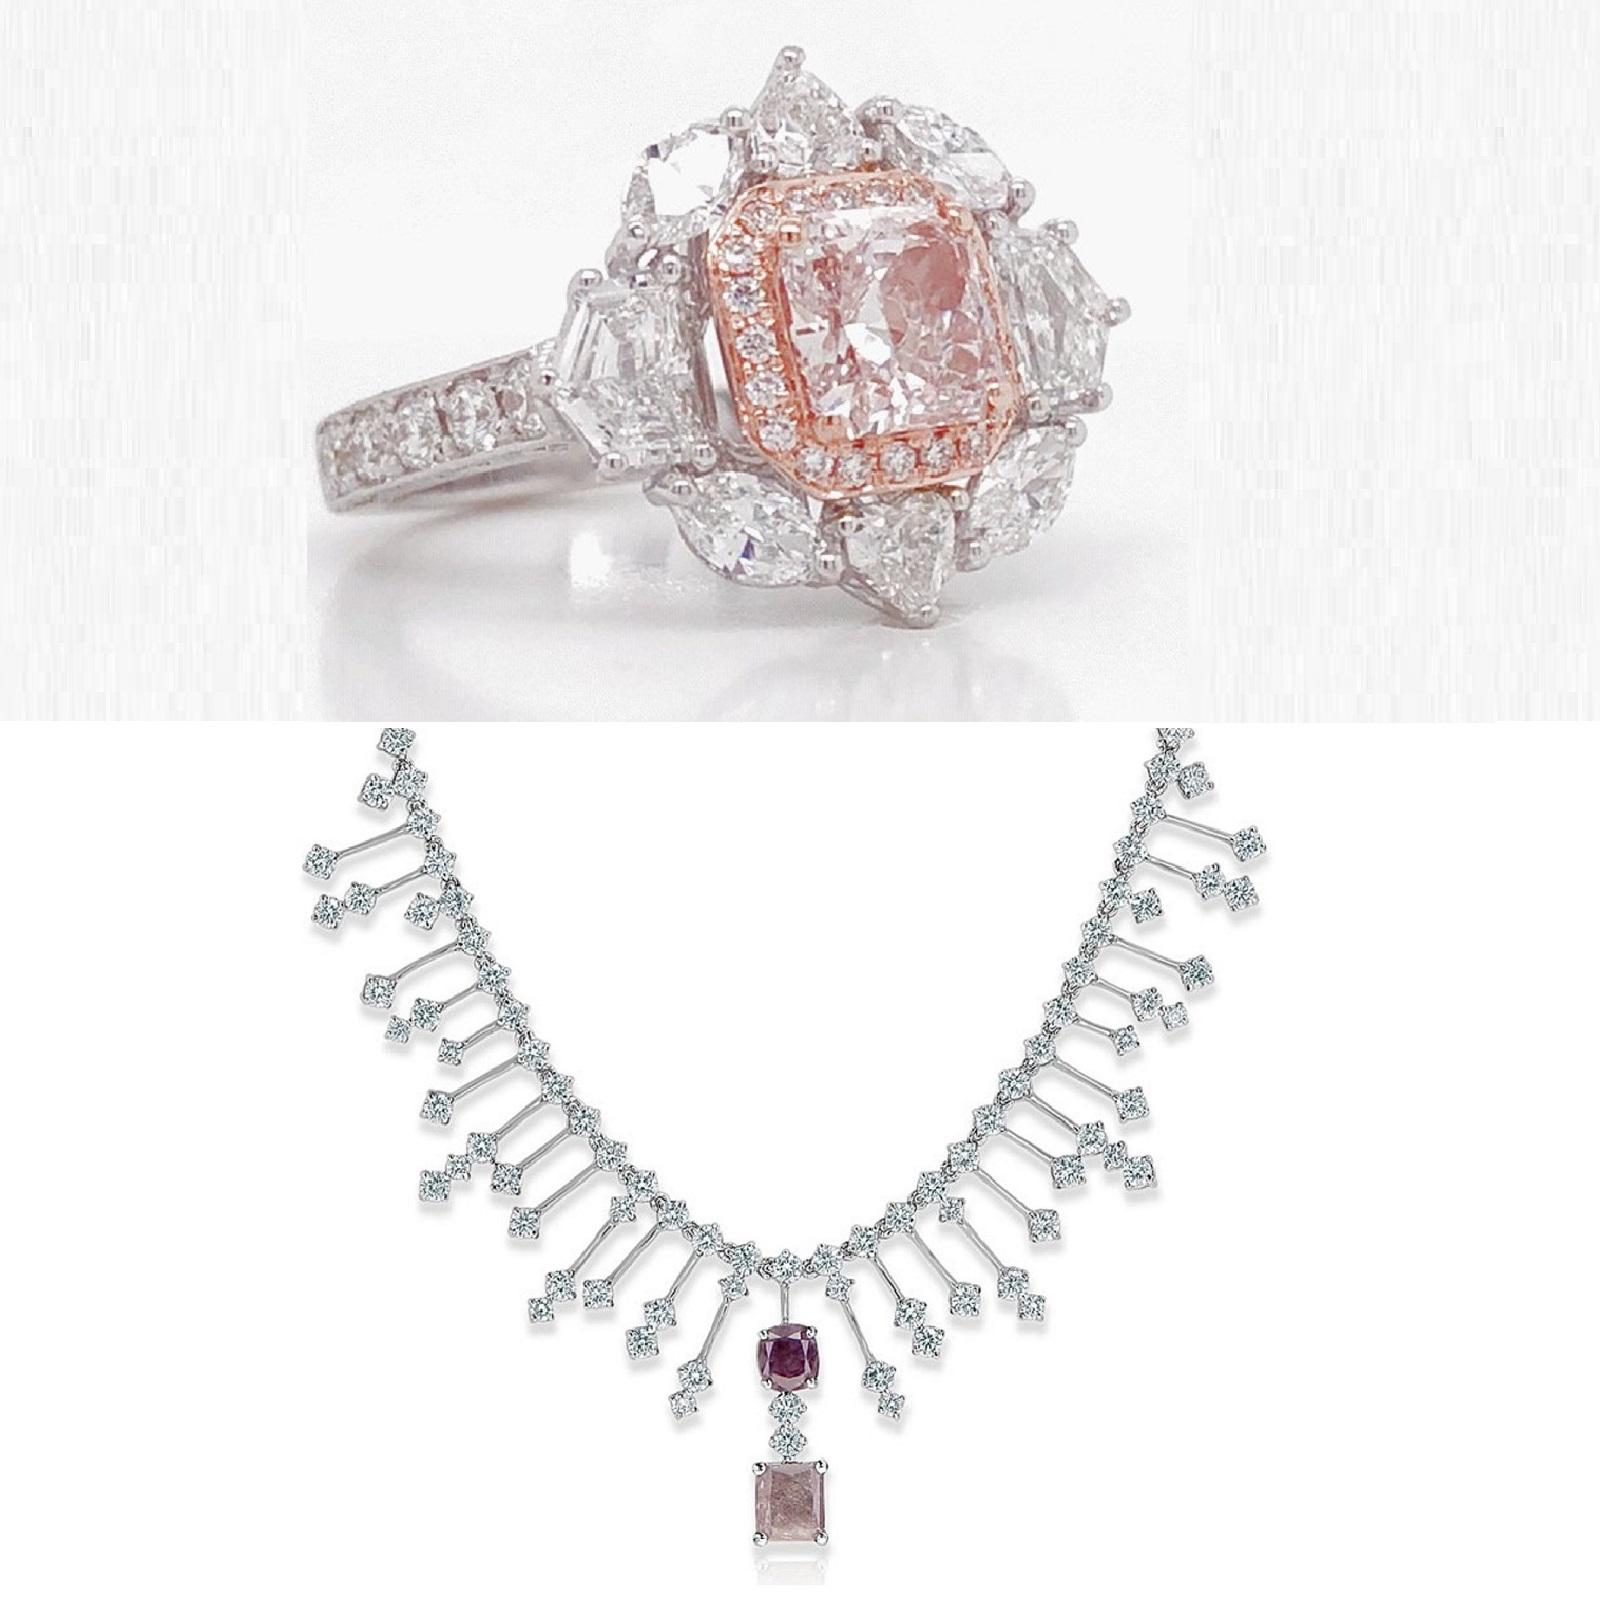 Mixed IF & Light Brownish Pink Diamond Ring & Pendant Set (14.59ct TW)